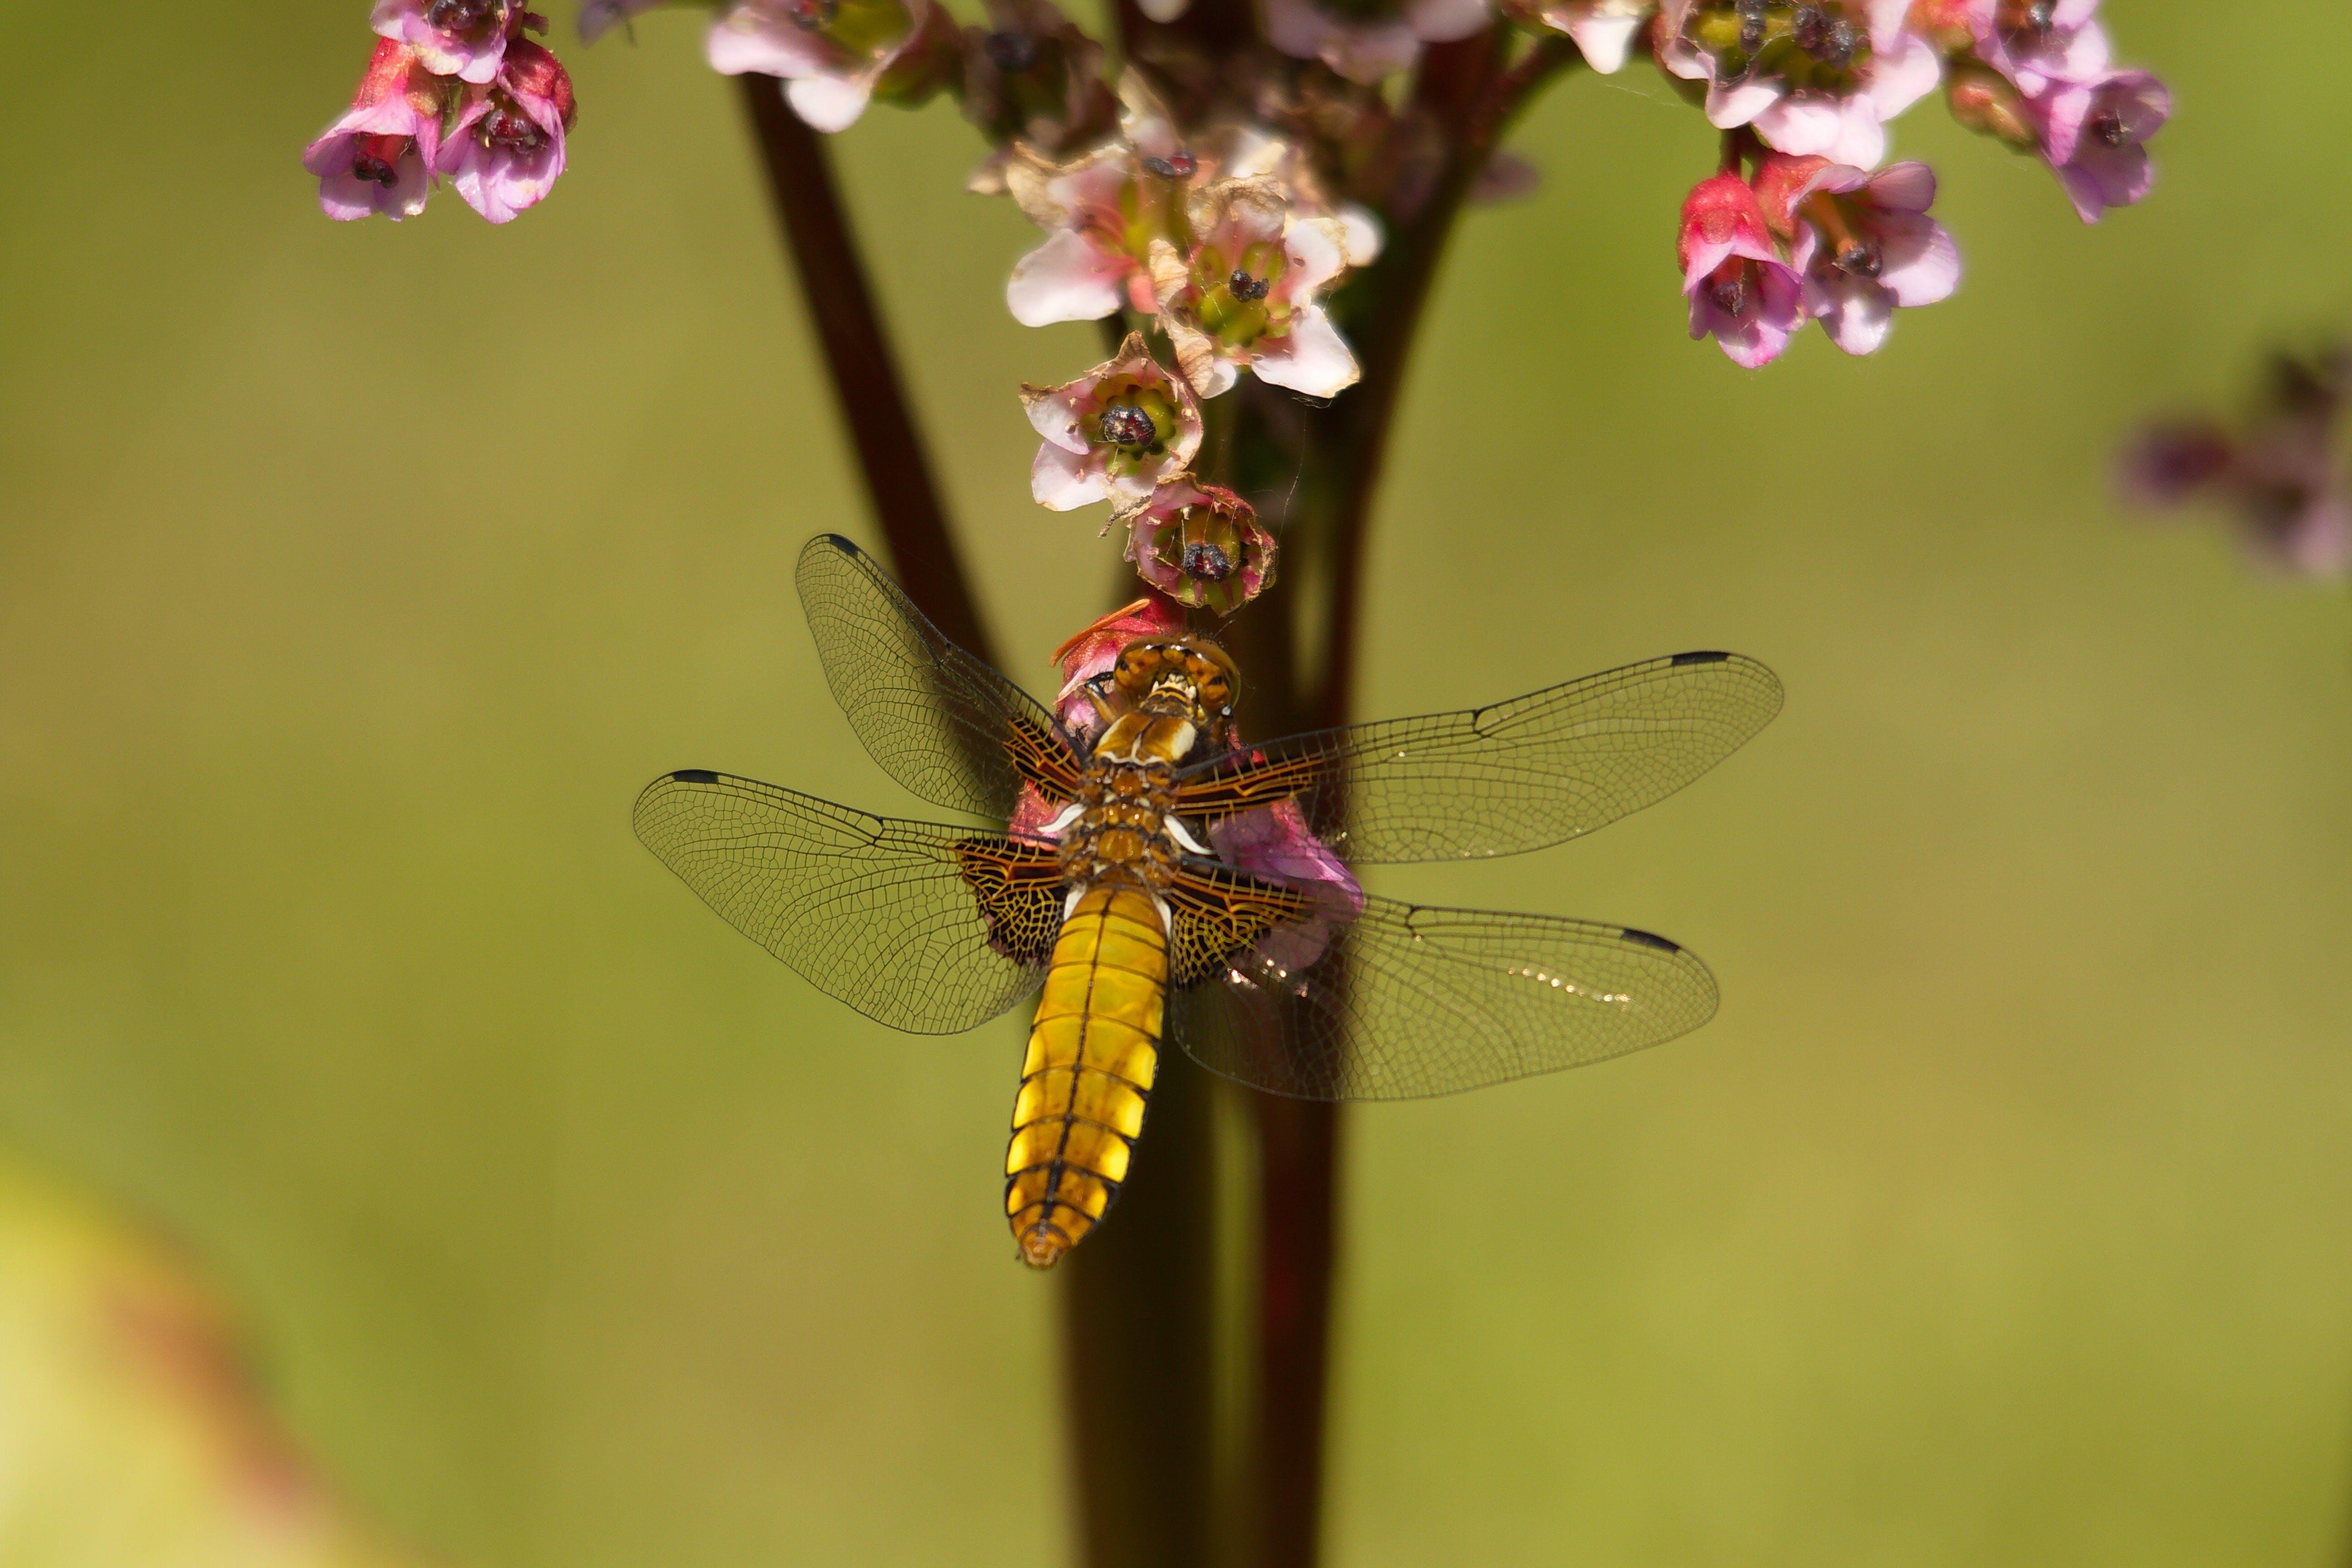 Brown Dragonfly Near Flower